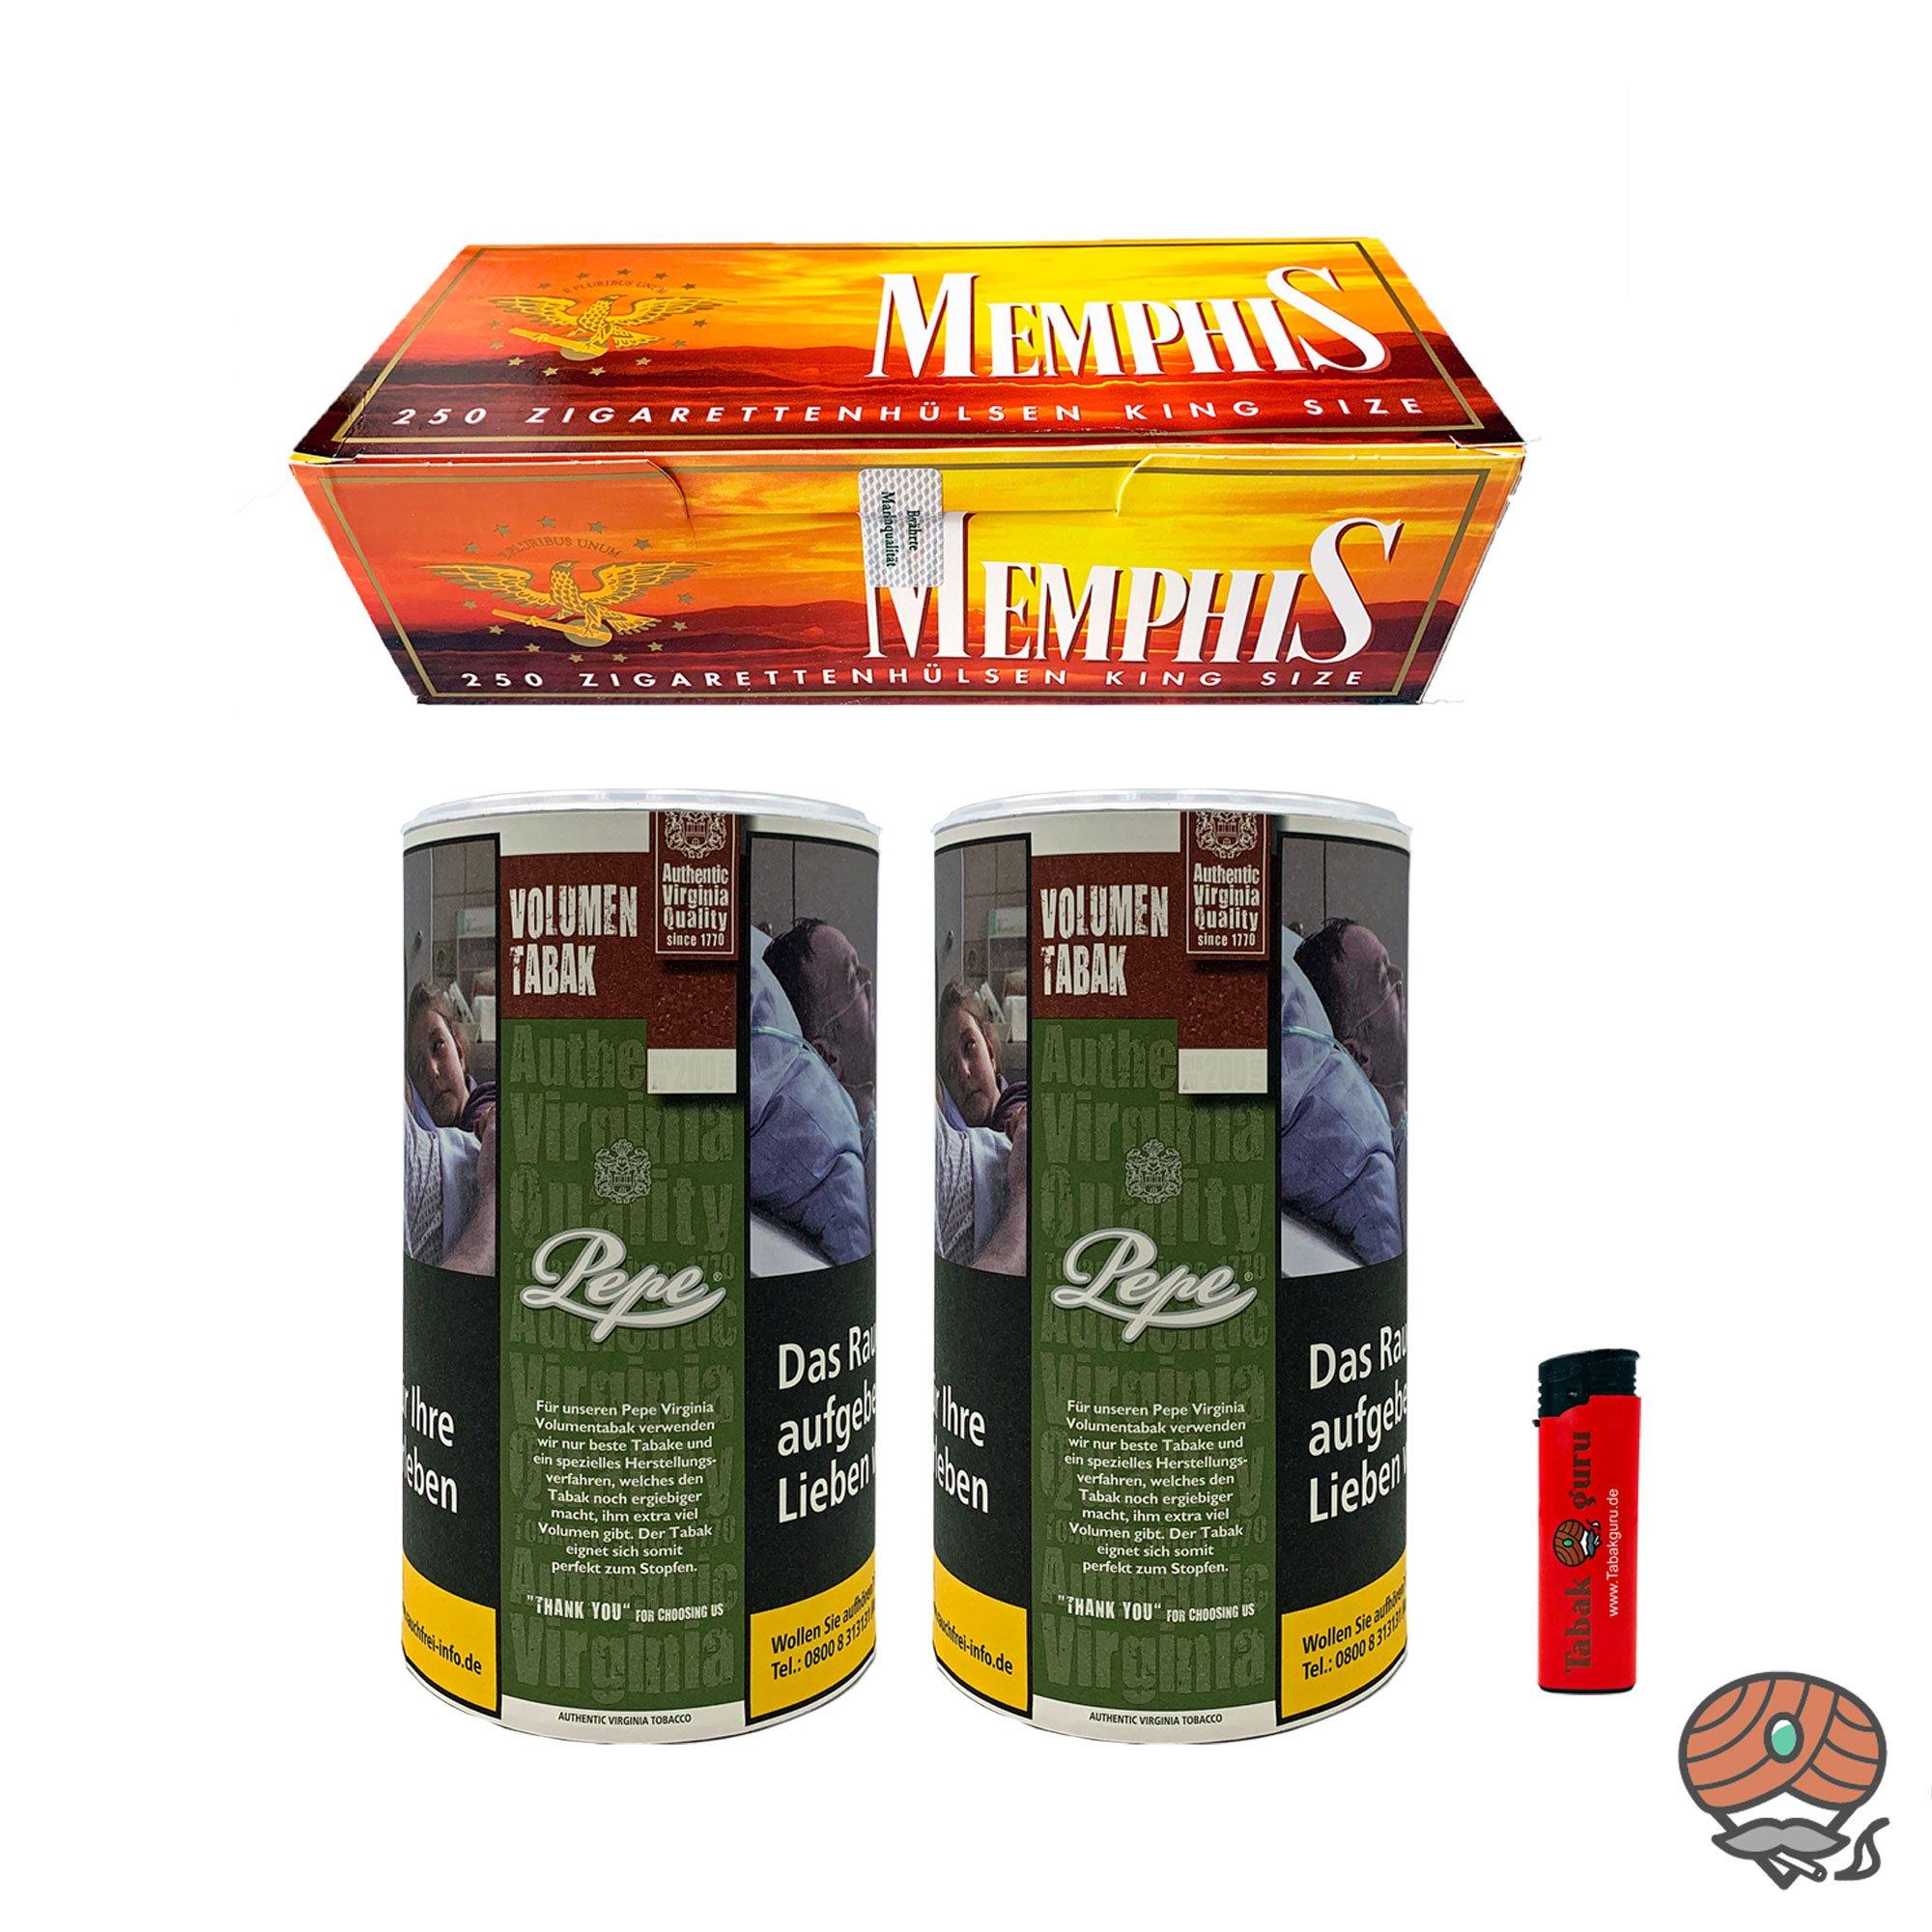 2 x Pepe Rich Green Tabak / Volumentabak 85g + Memphis King Size Hülsen